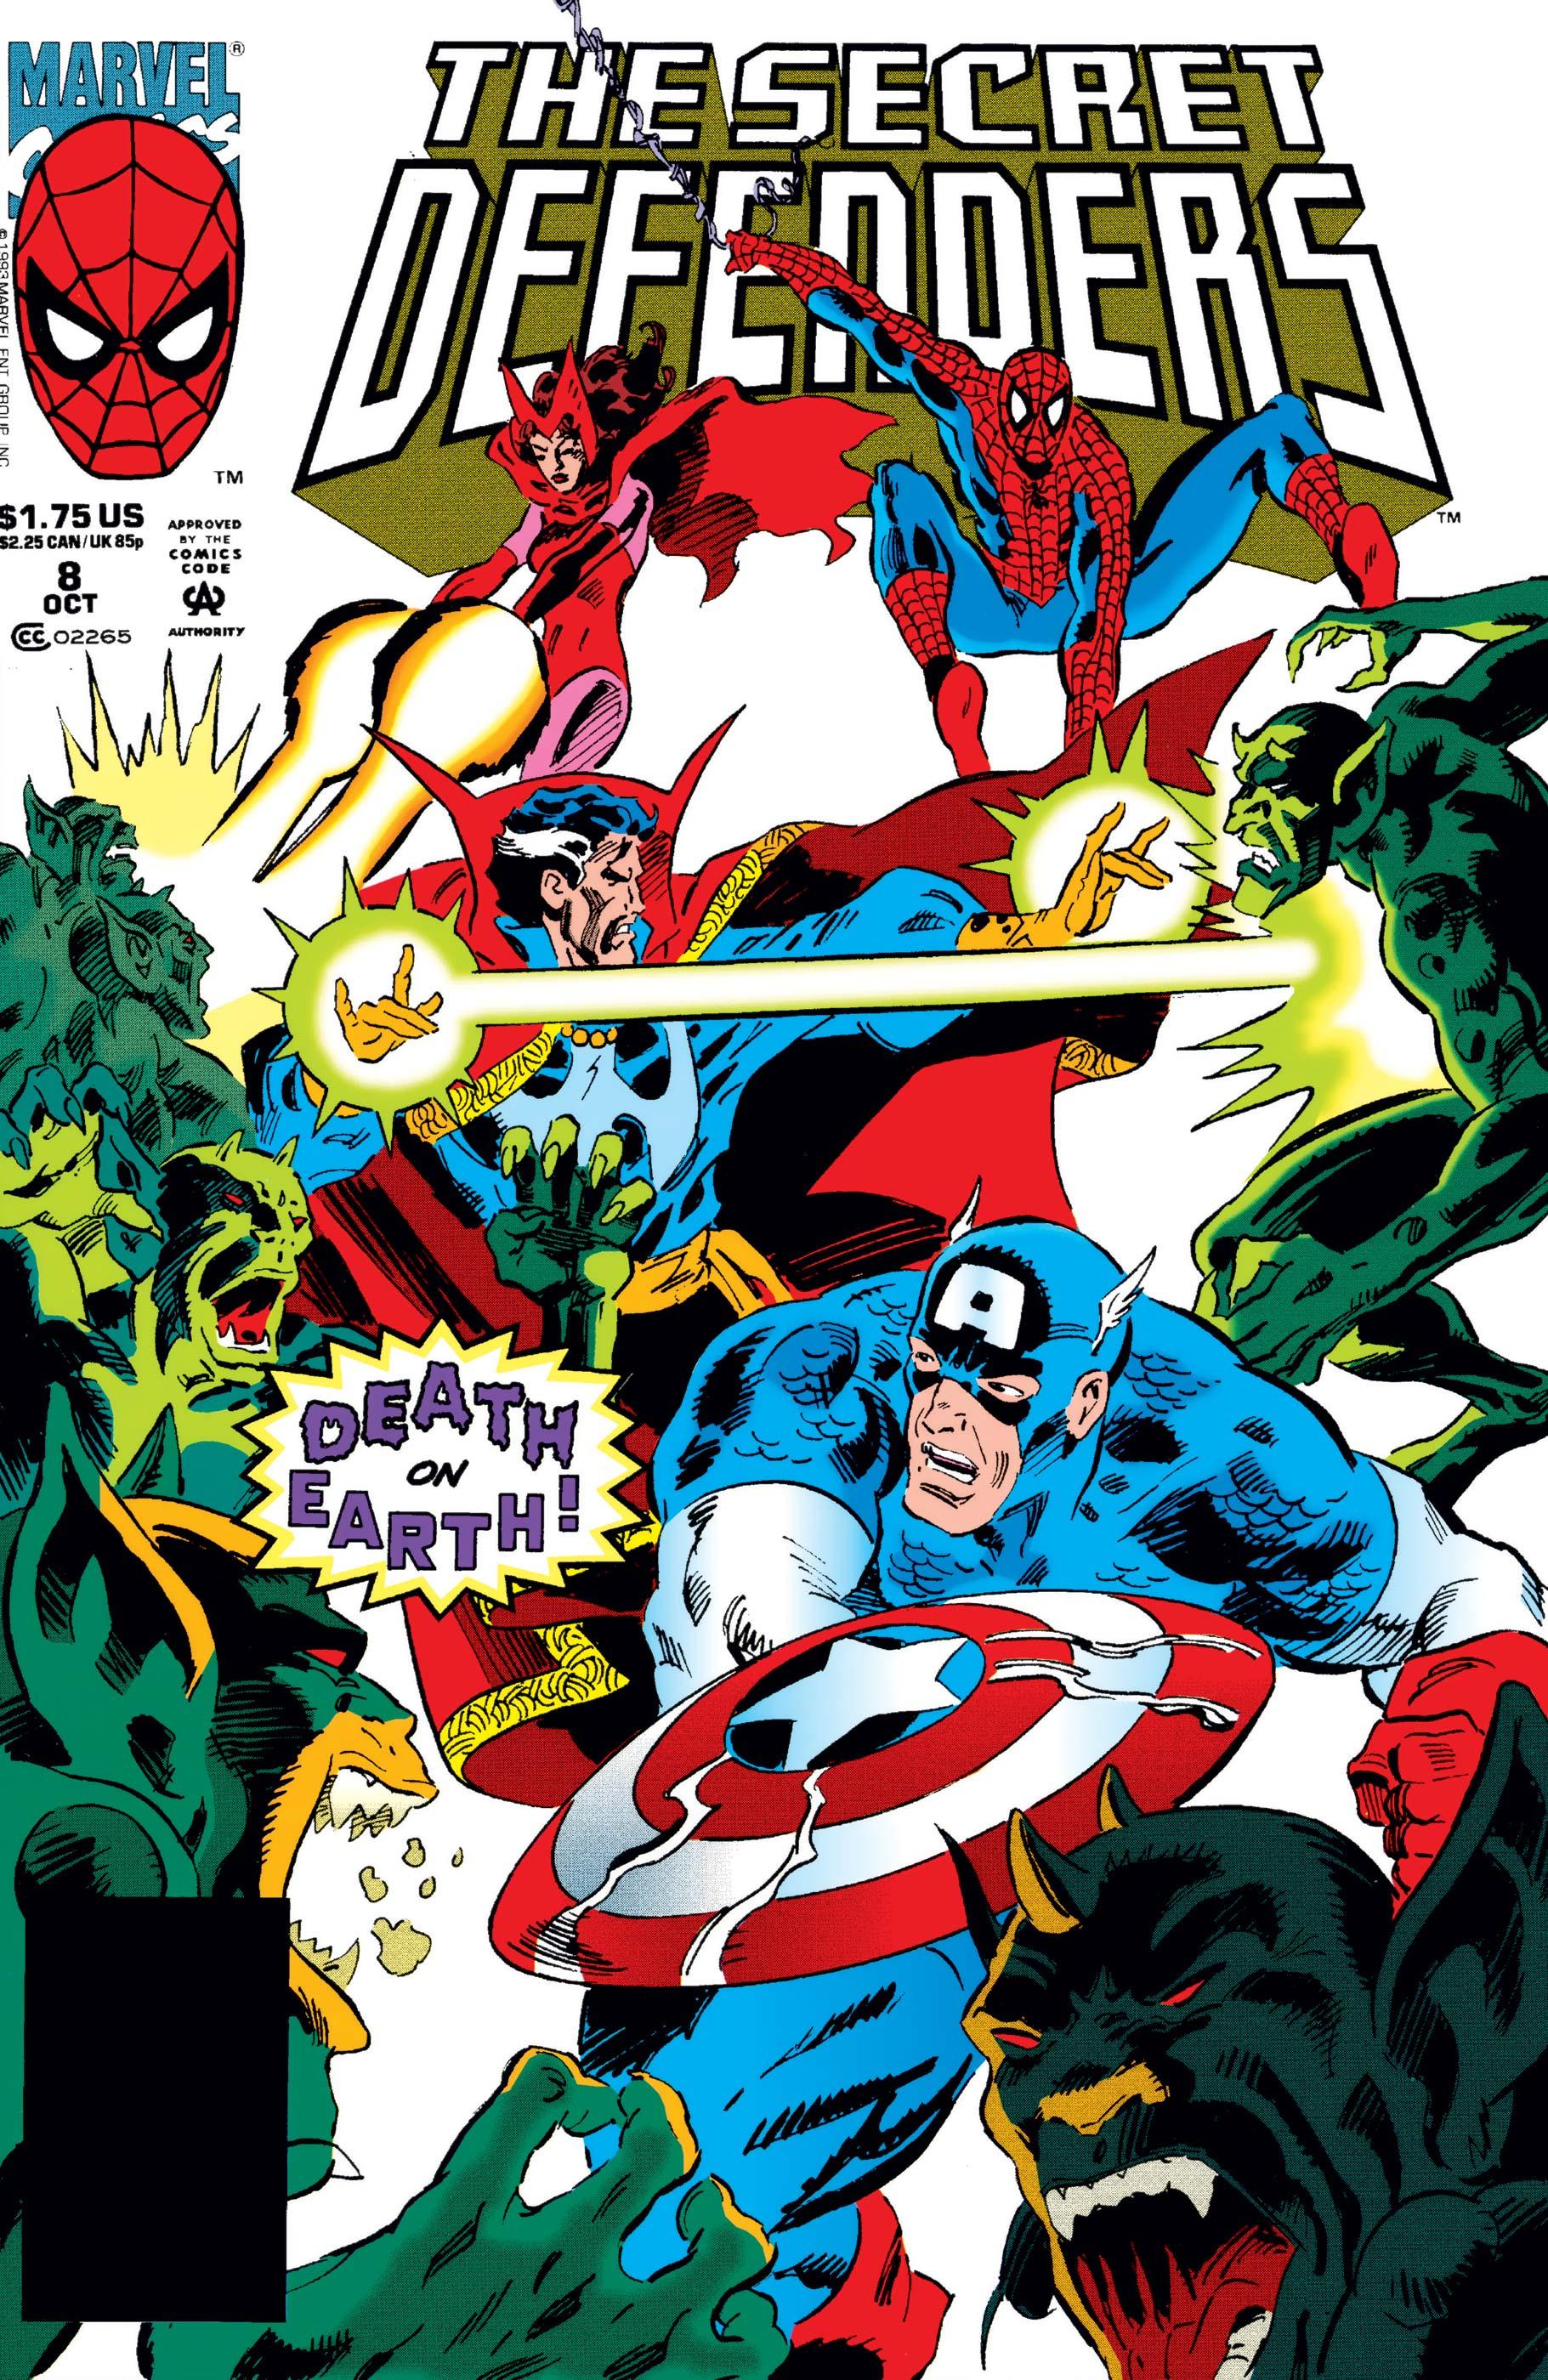 Secret Defenders (1993) #8